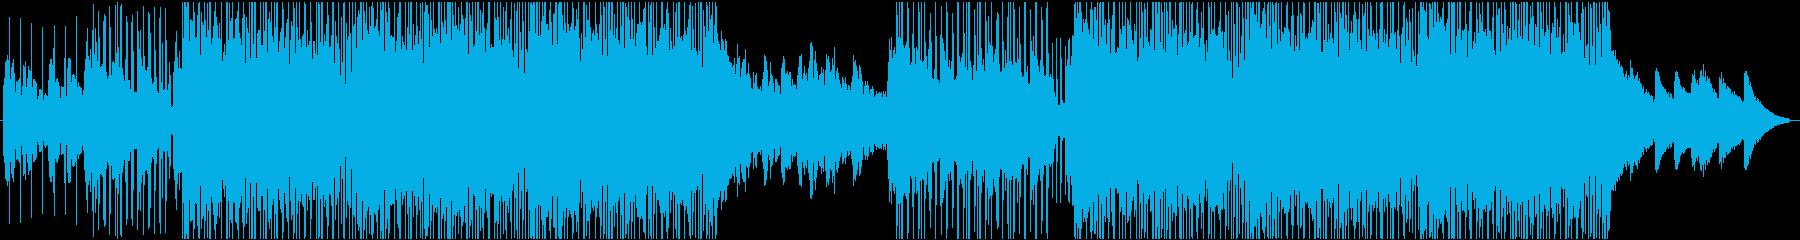 Soft EDM's reproduced waveform